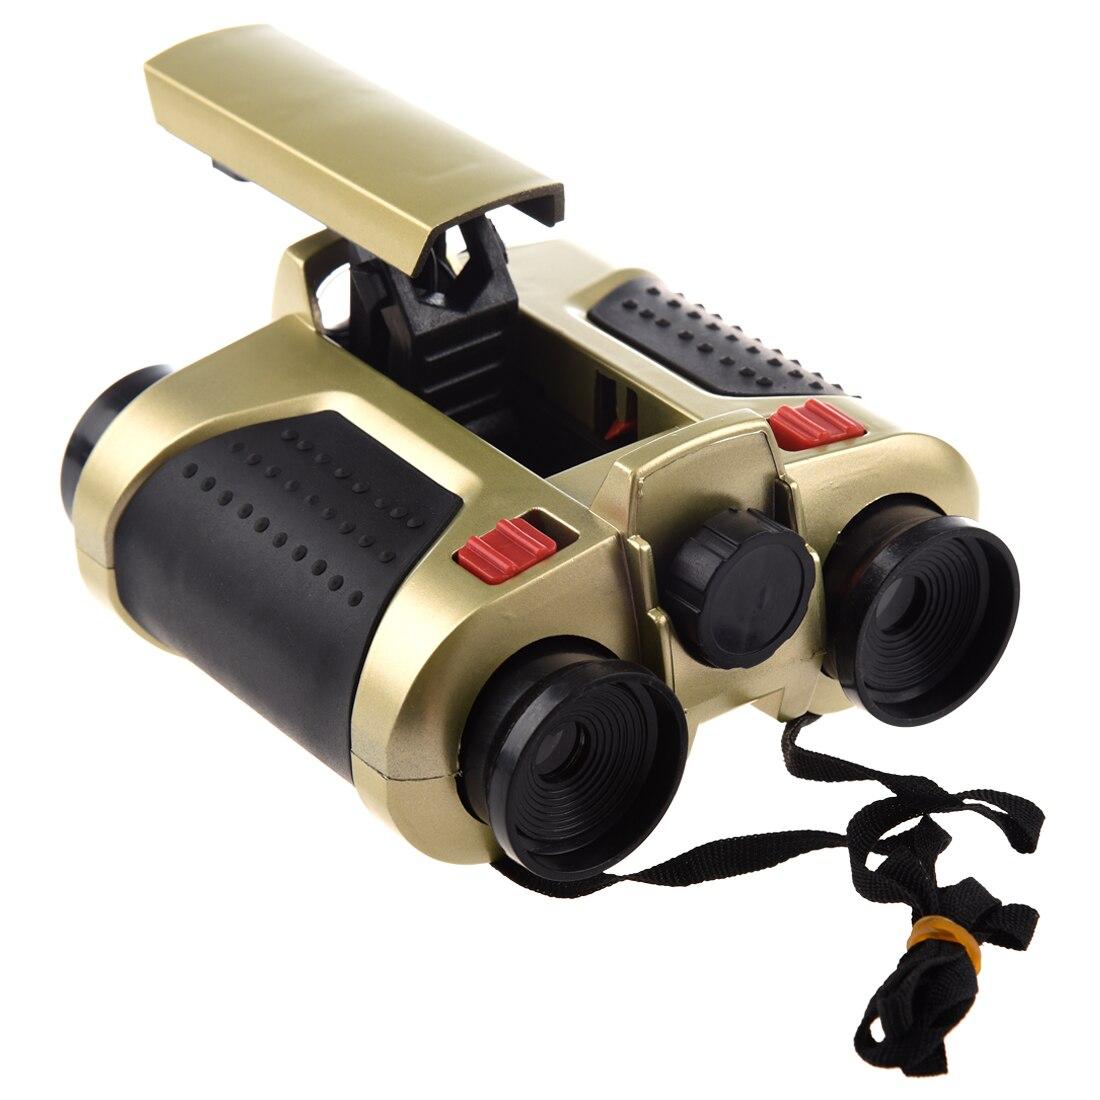 Useful 4x30 Night Scope Binoculars w/ POP Up Light